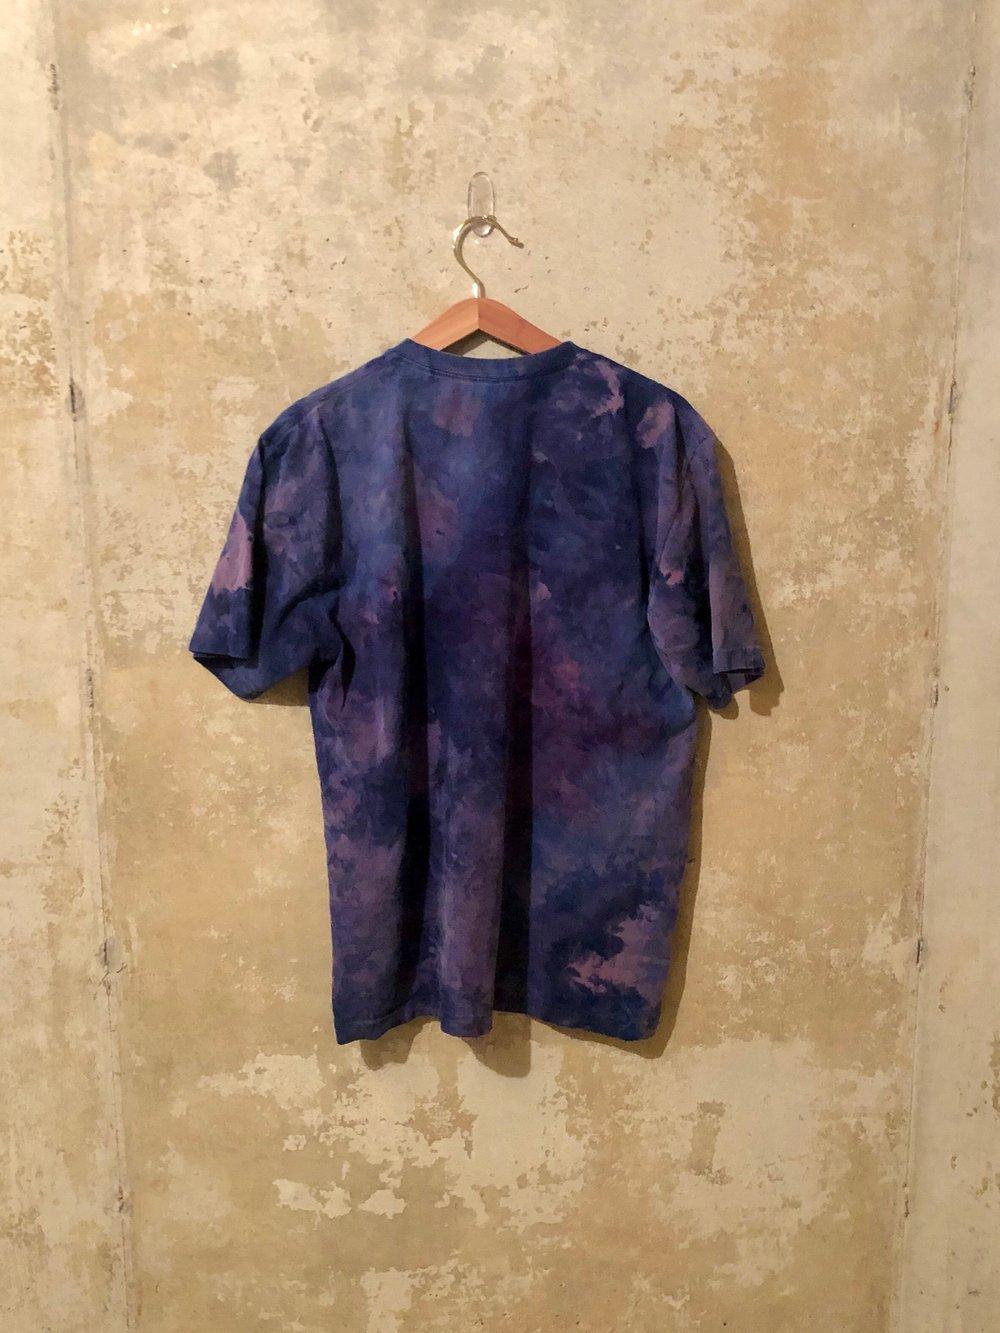 Medium Puff Print Tie Dye Shirt #4